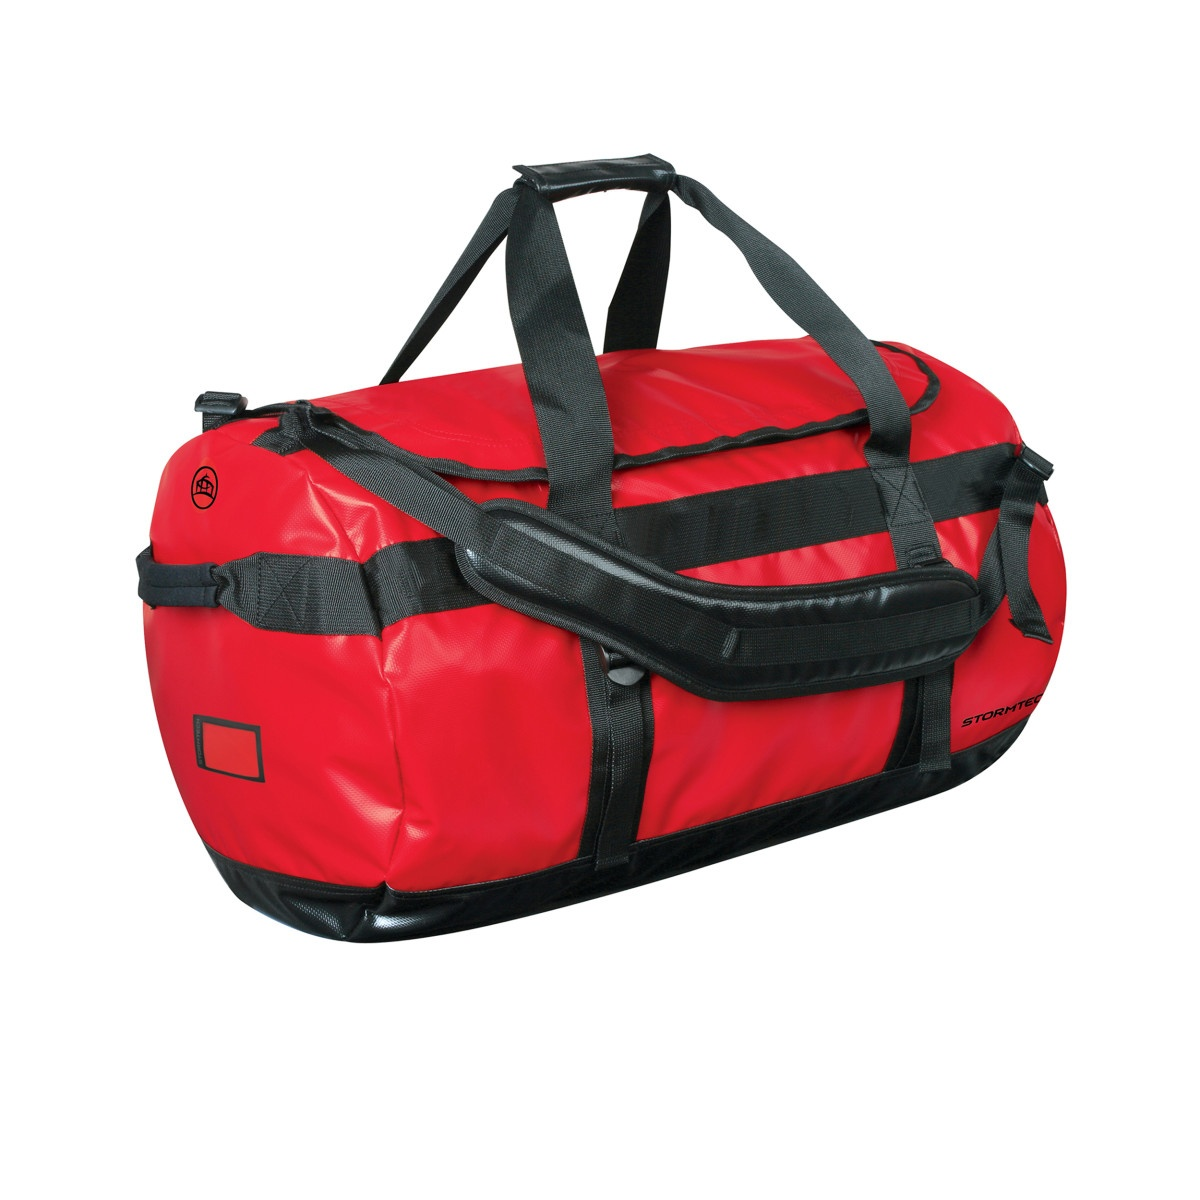 Stormtech Waterproof Gear Holdall Bag (Medium) (One Size) (Ocean Blue/Black)